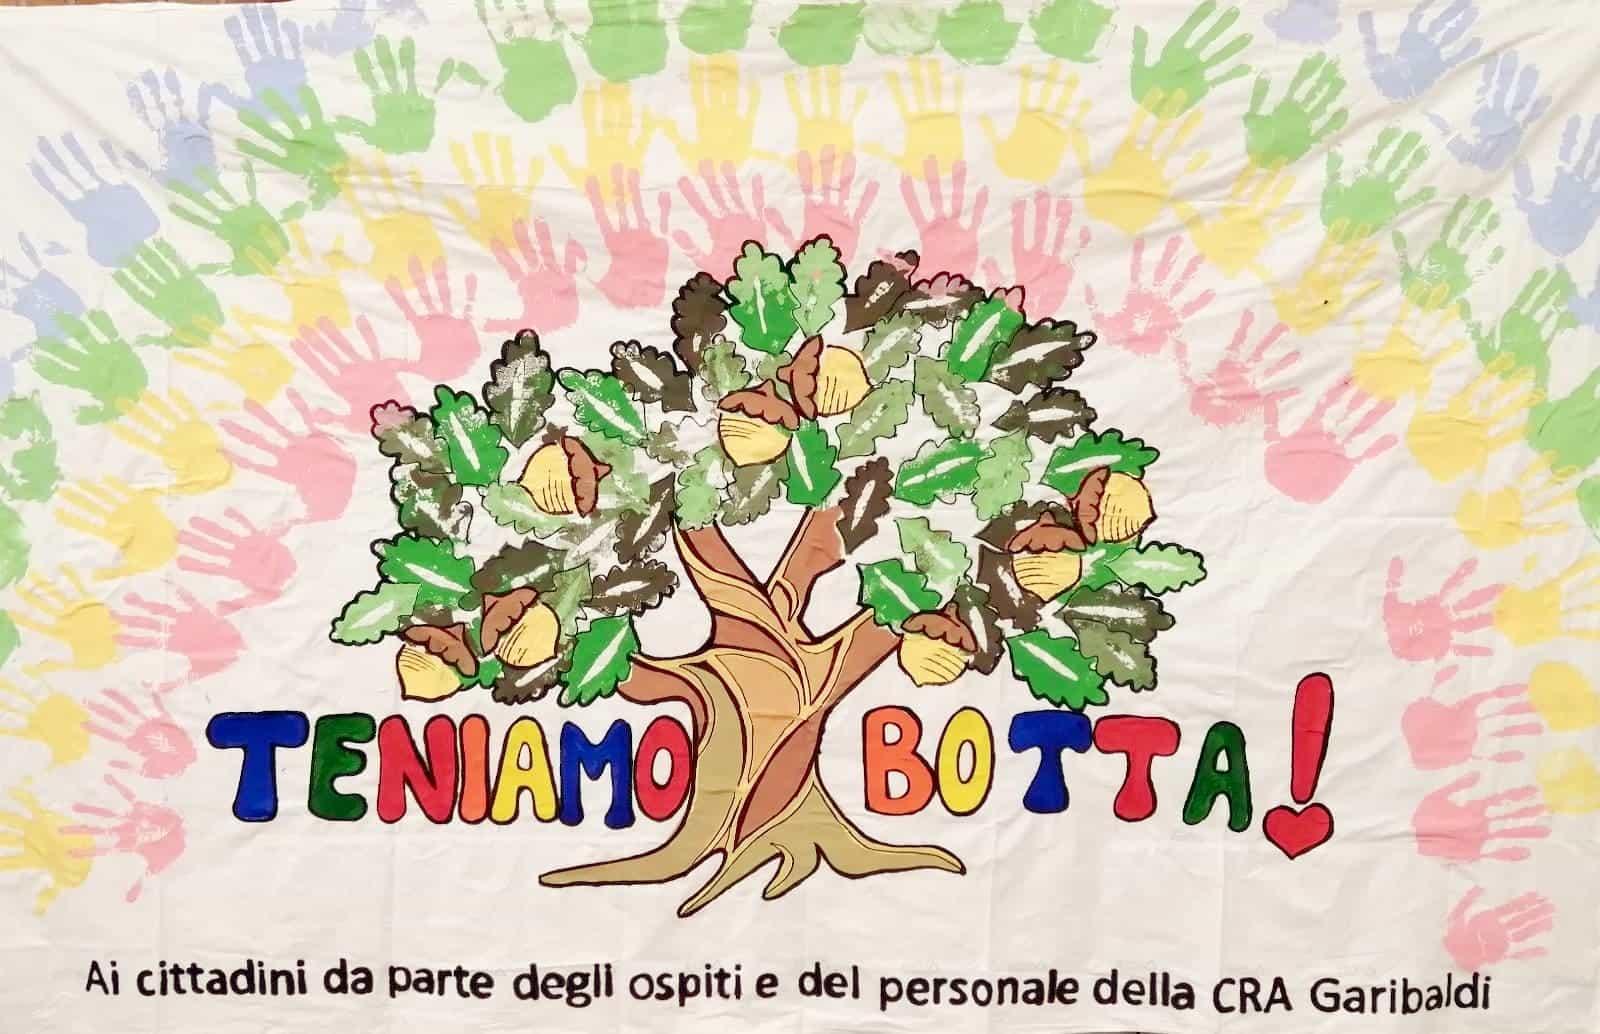 cra garibaldi Ravenna - teniamo botta (1)-2